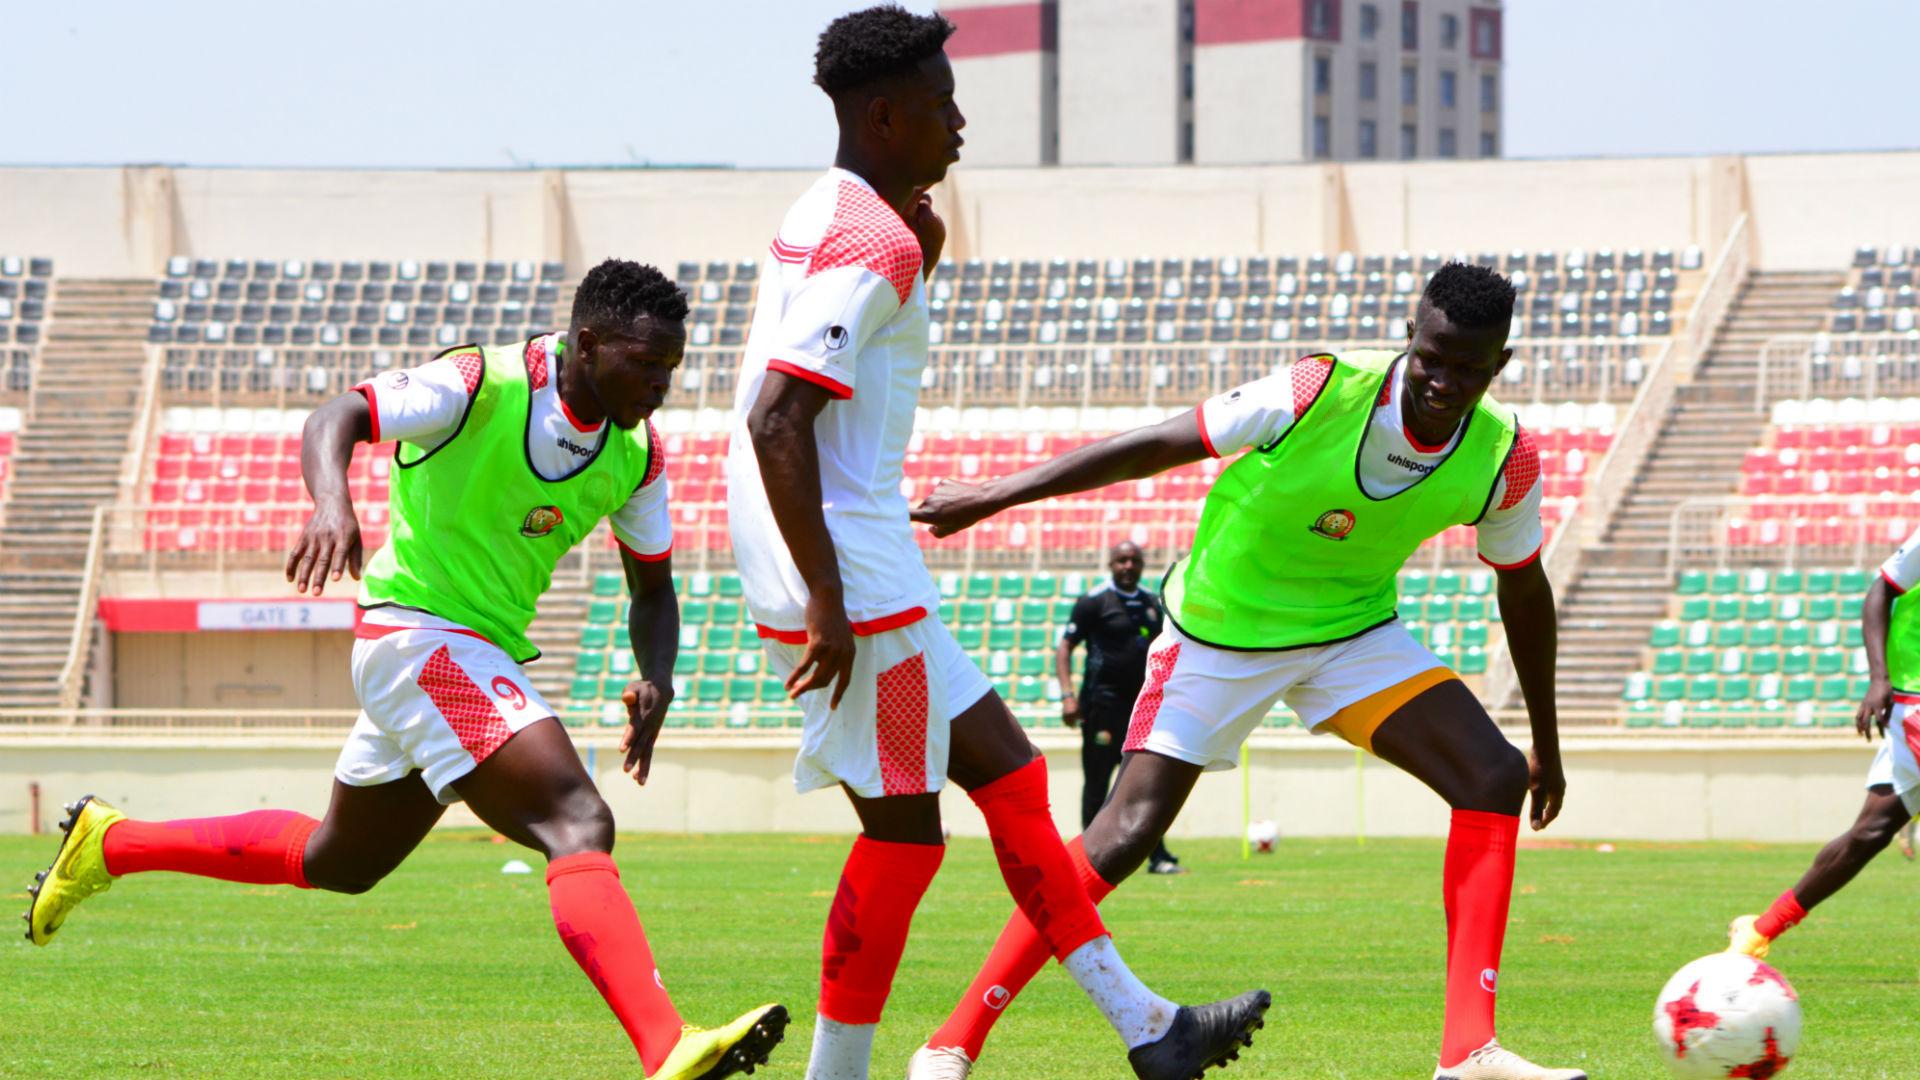 Harambee Stars were going for win in Comoros - Akumu